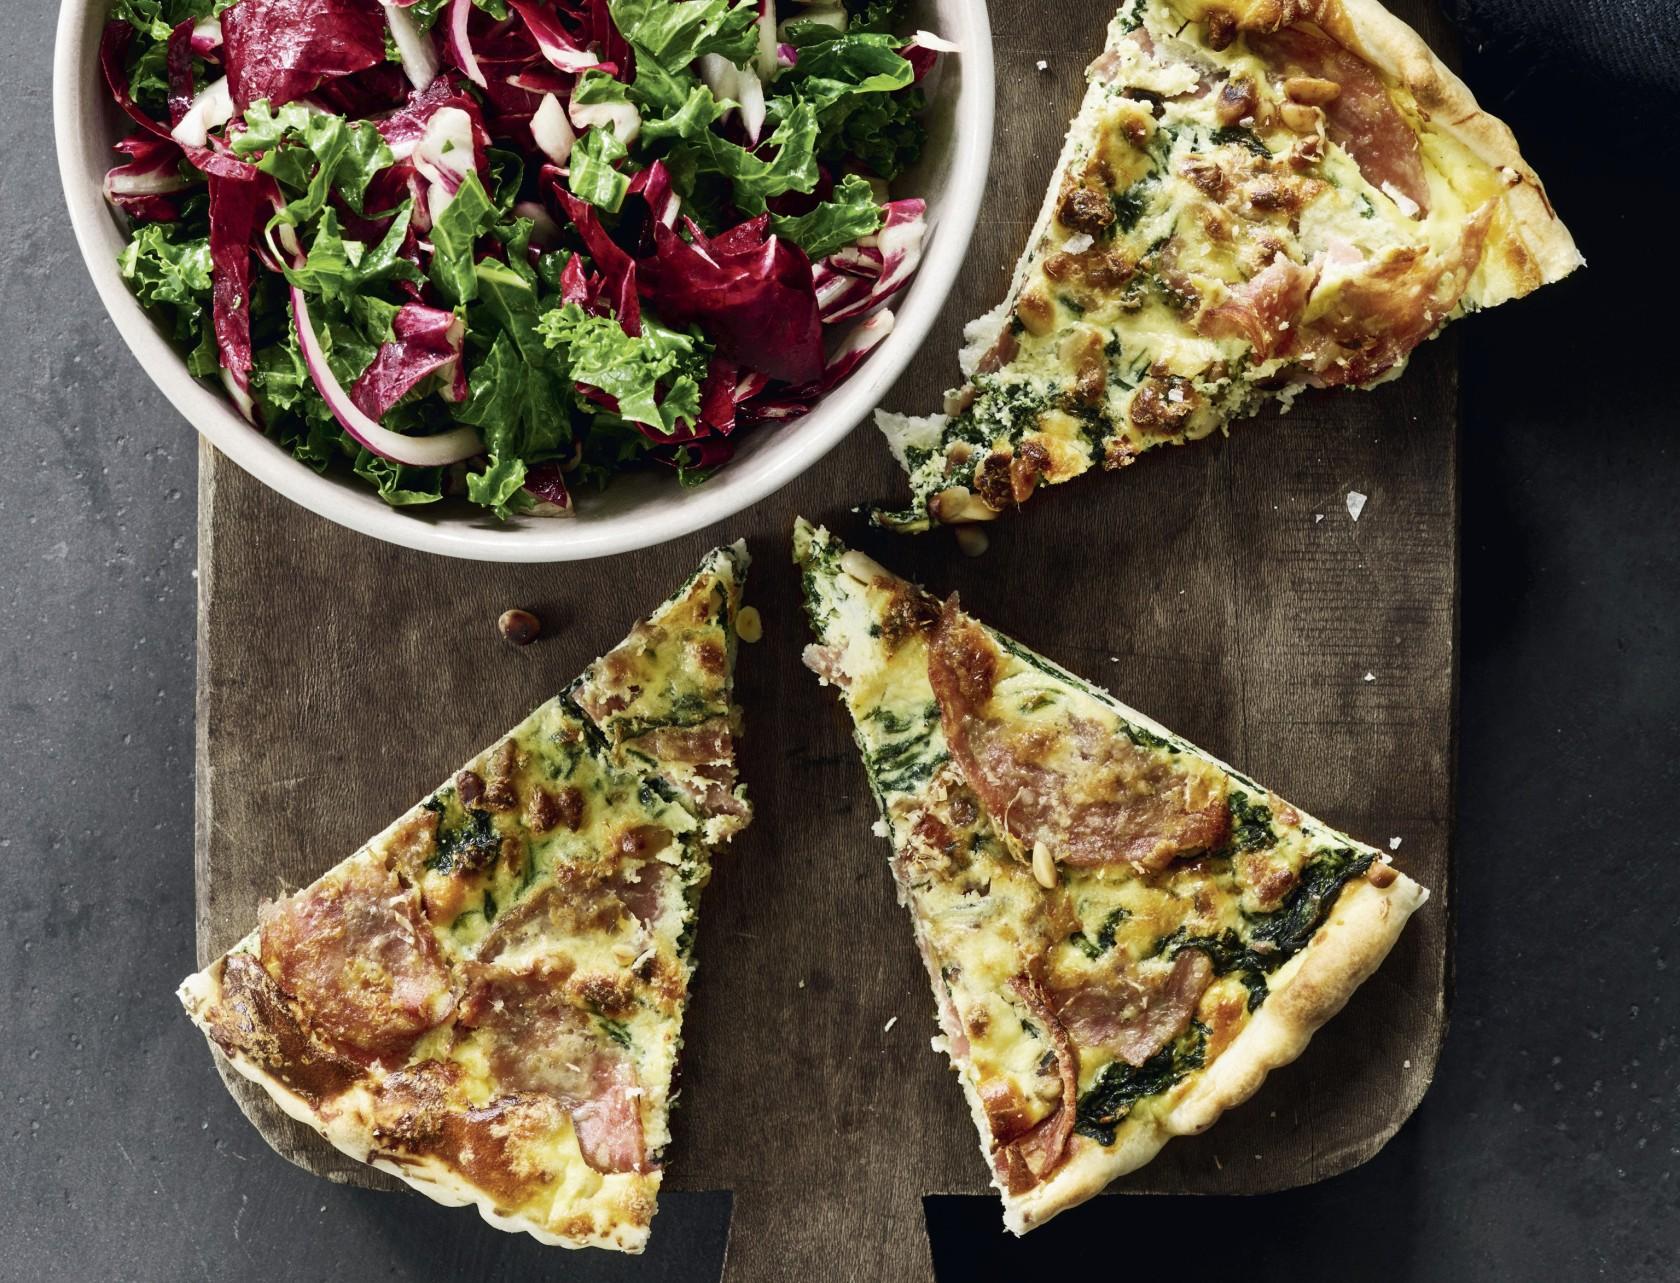 Spinattærte med chorizo og frisk salat